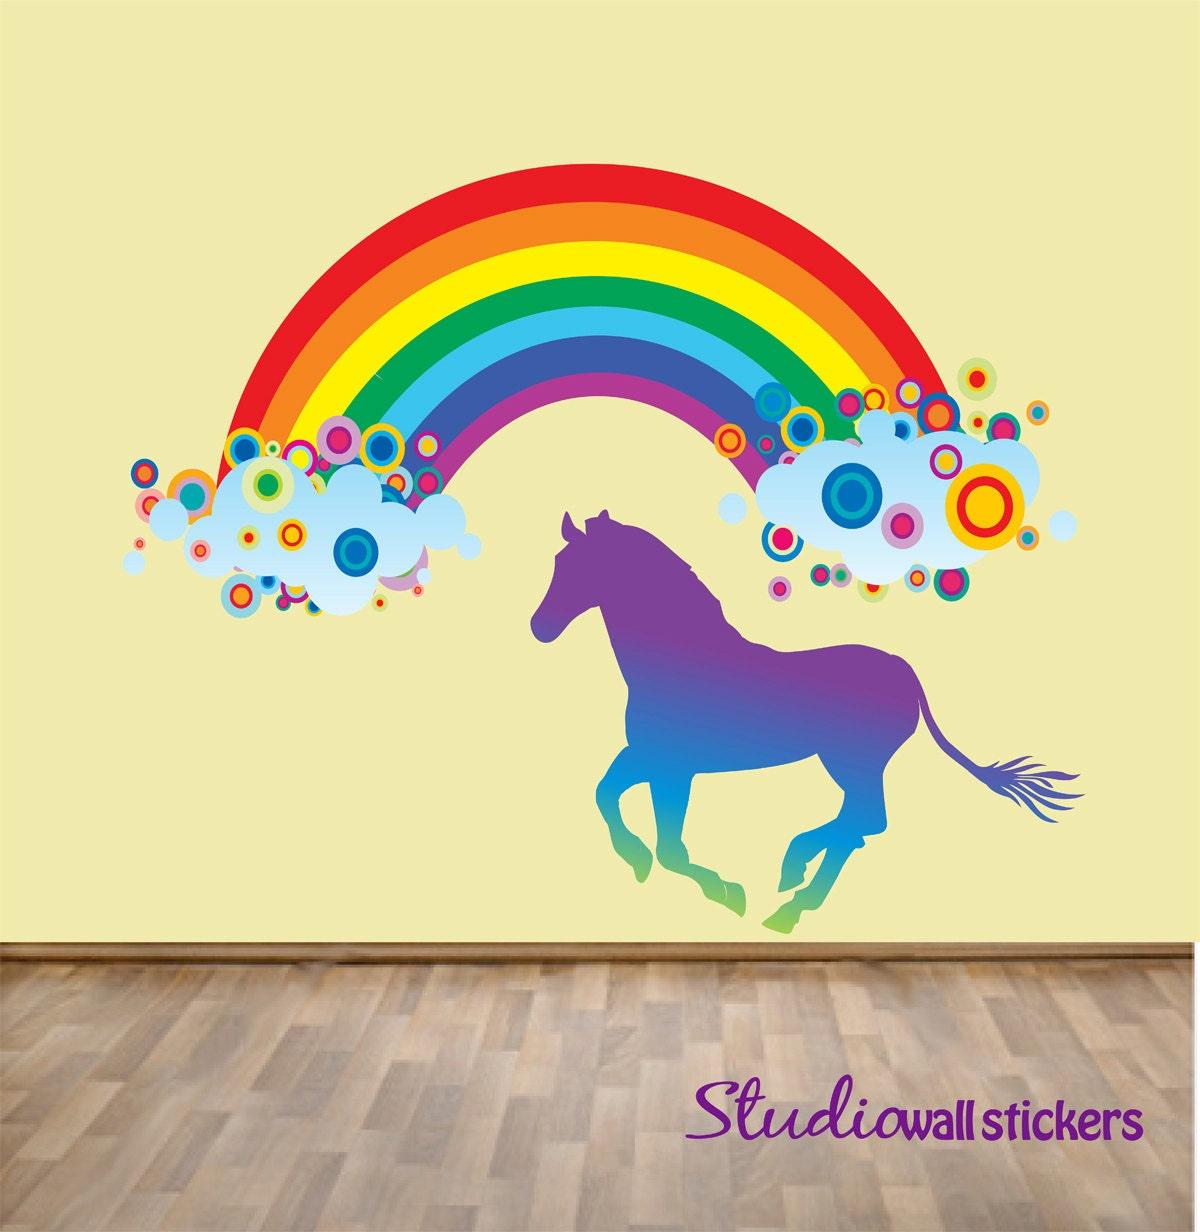 Rainbow Wall Decor Stickers : Reusable rainbow horse wall decal childrens fabric